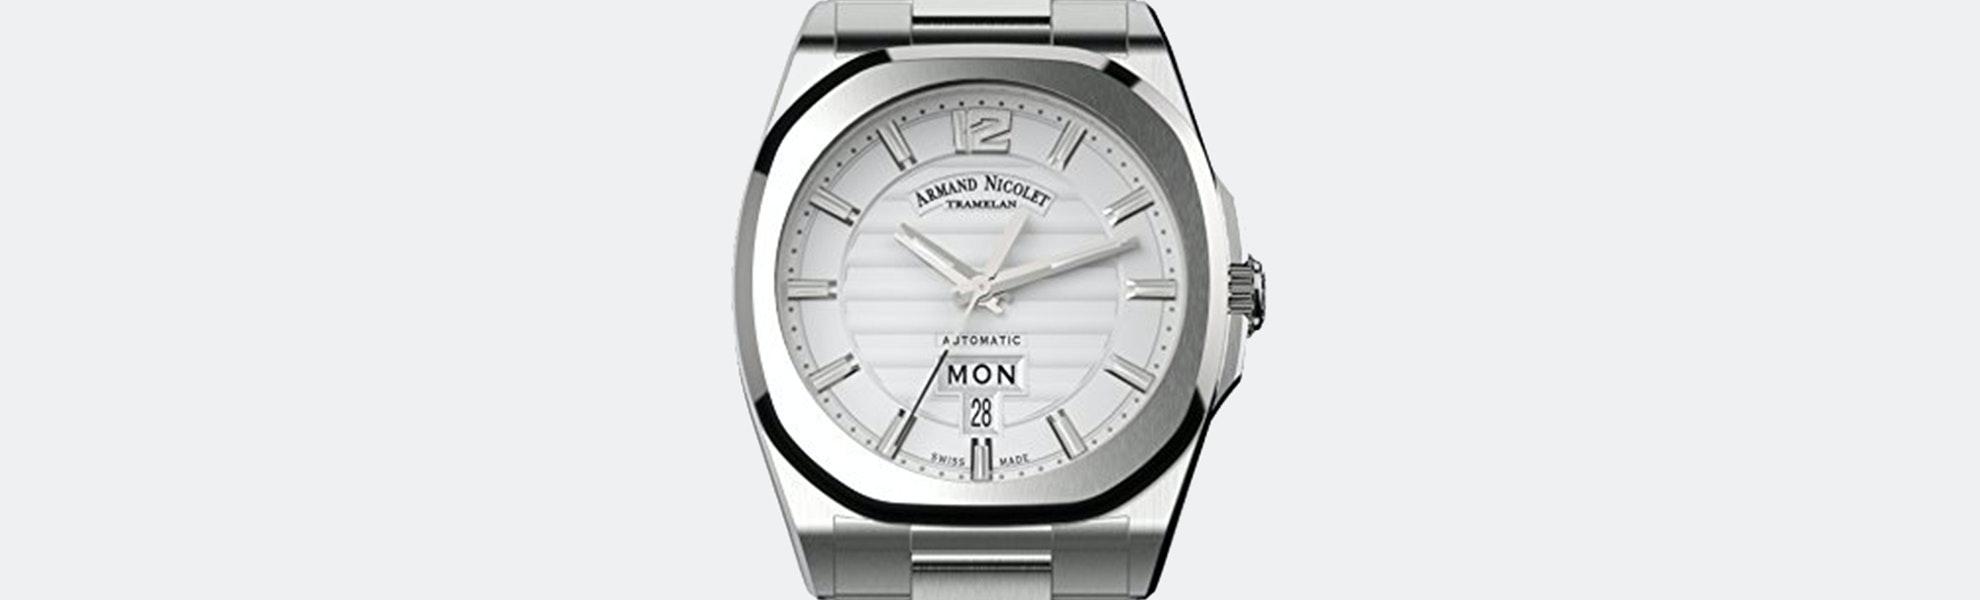 Armand Nicolet J09 Automatic Watch